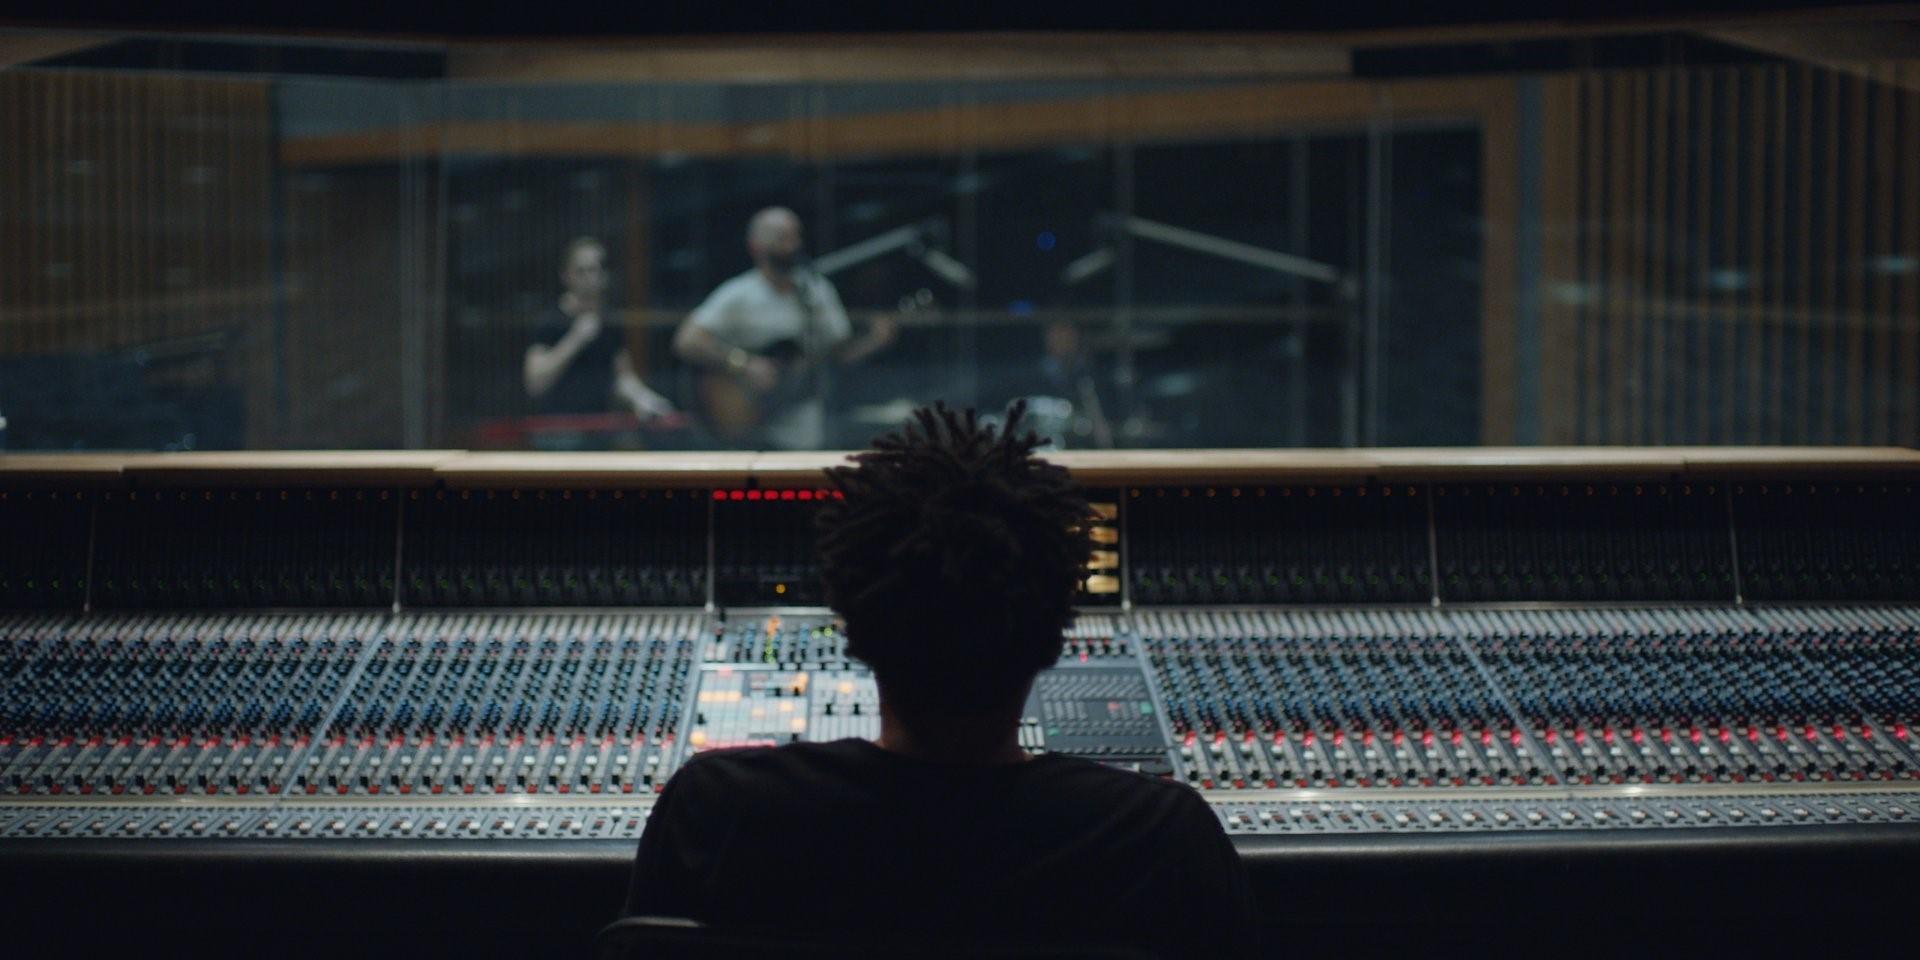 IBM Watson помогает музыкантам сочинять музыку - 2